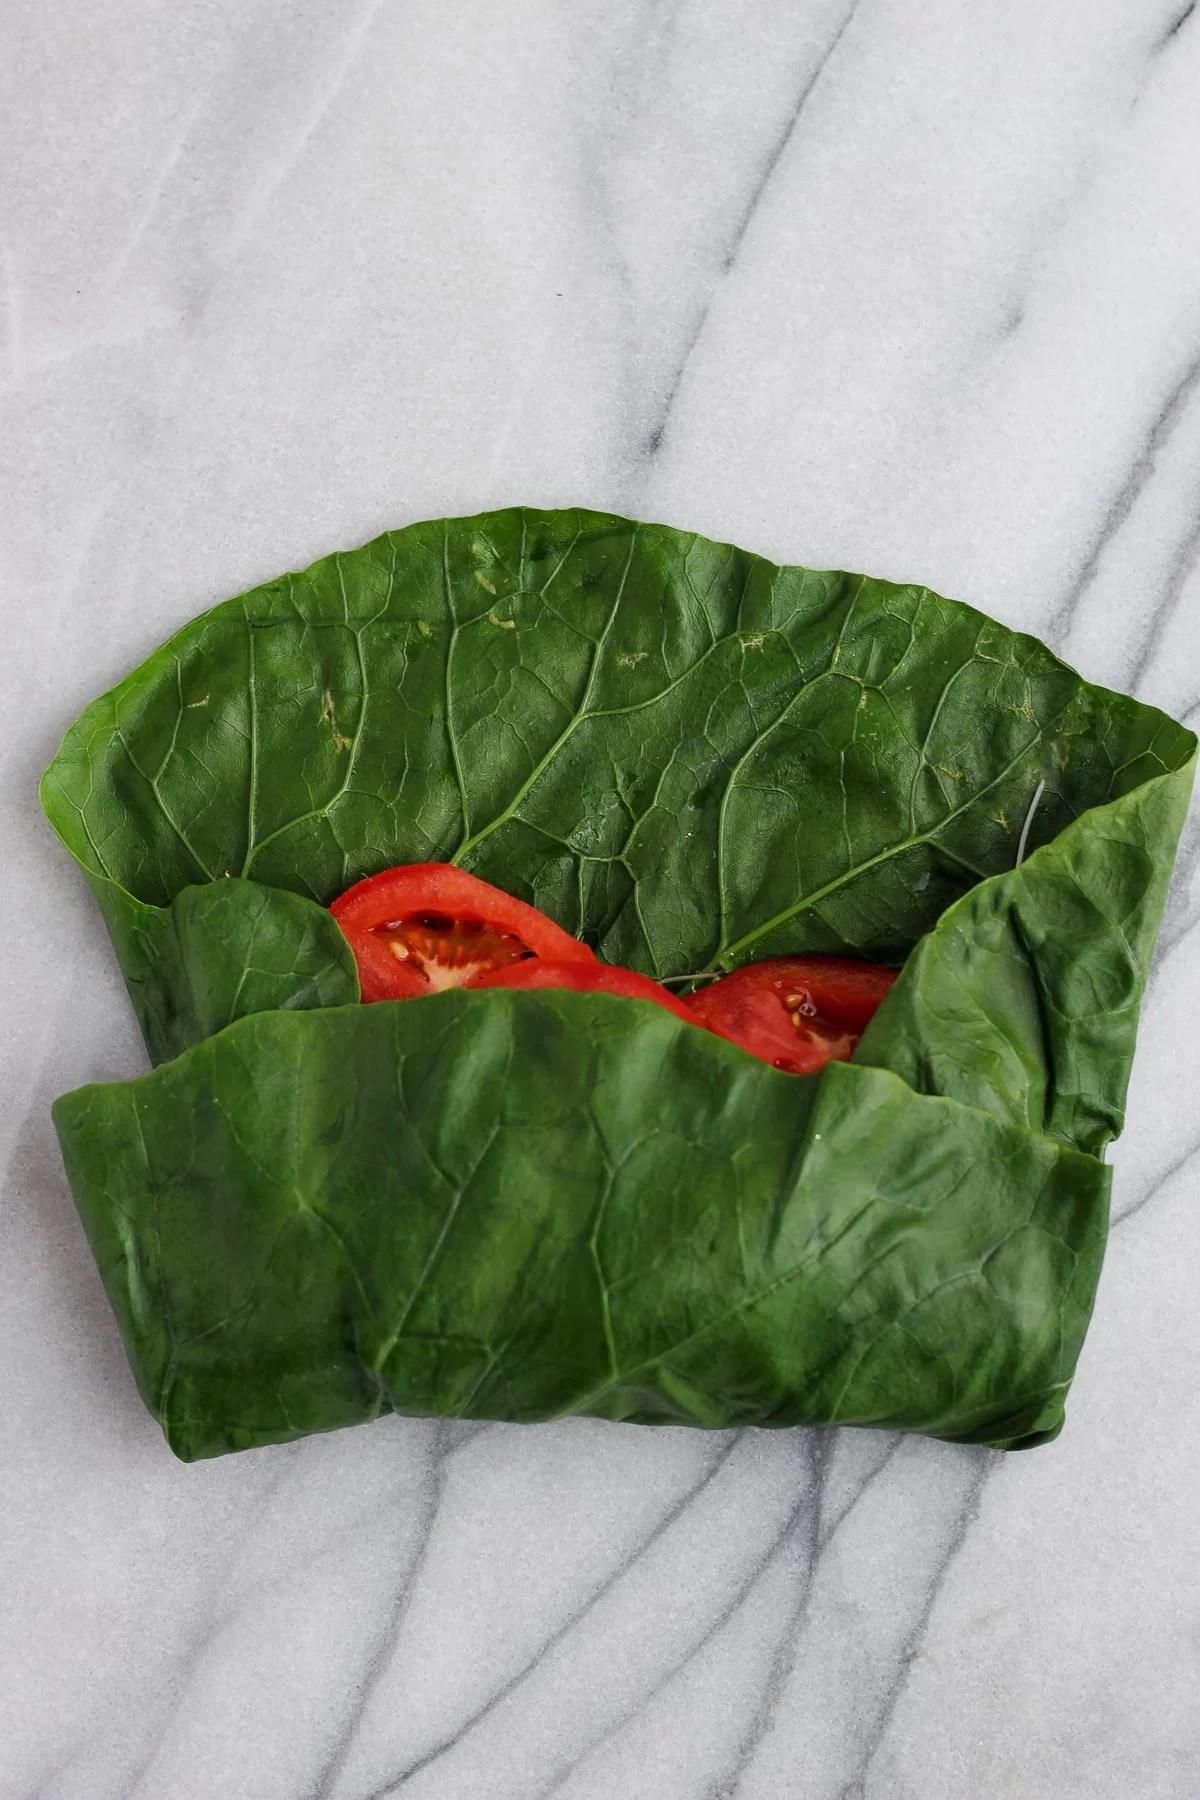 How to Prep Collard Green Wraps - a step by step tutorial! #collardgreenwrap